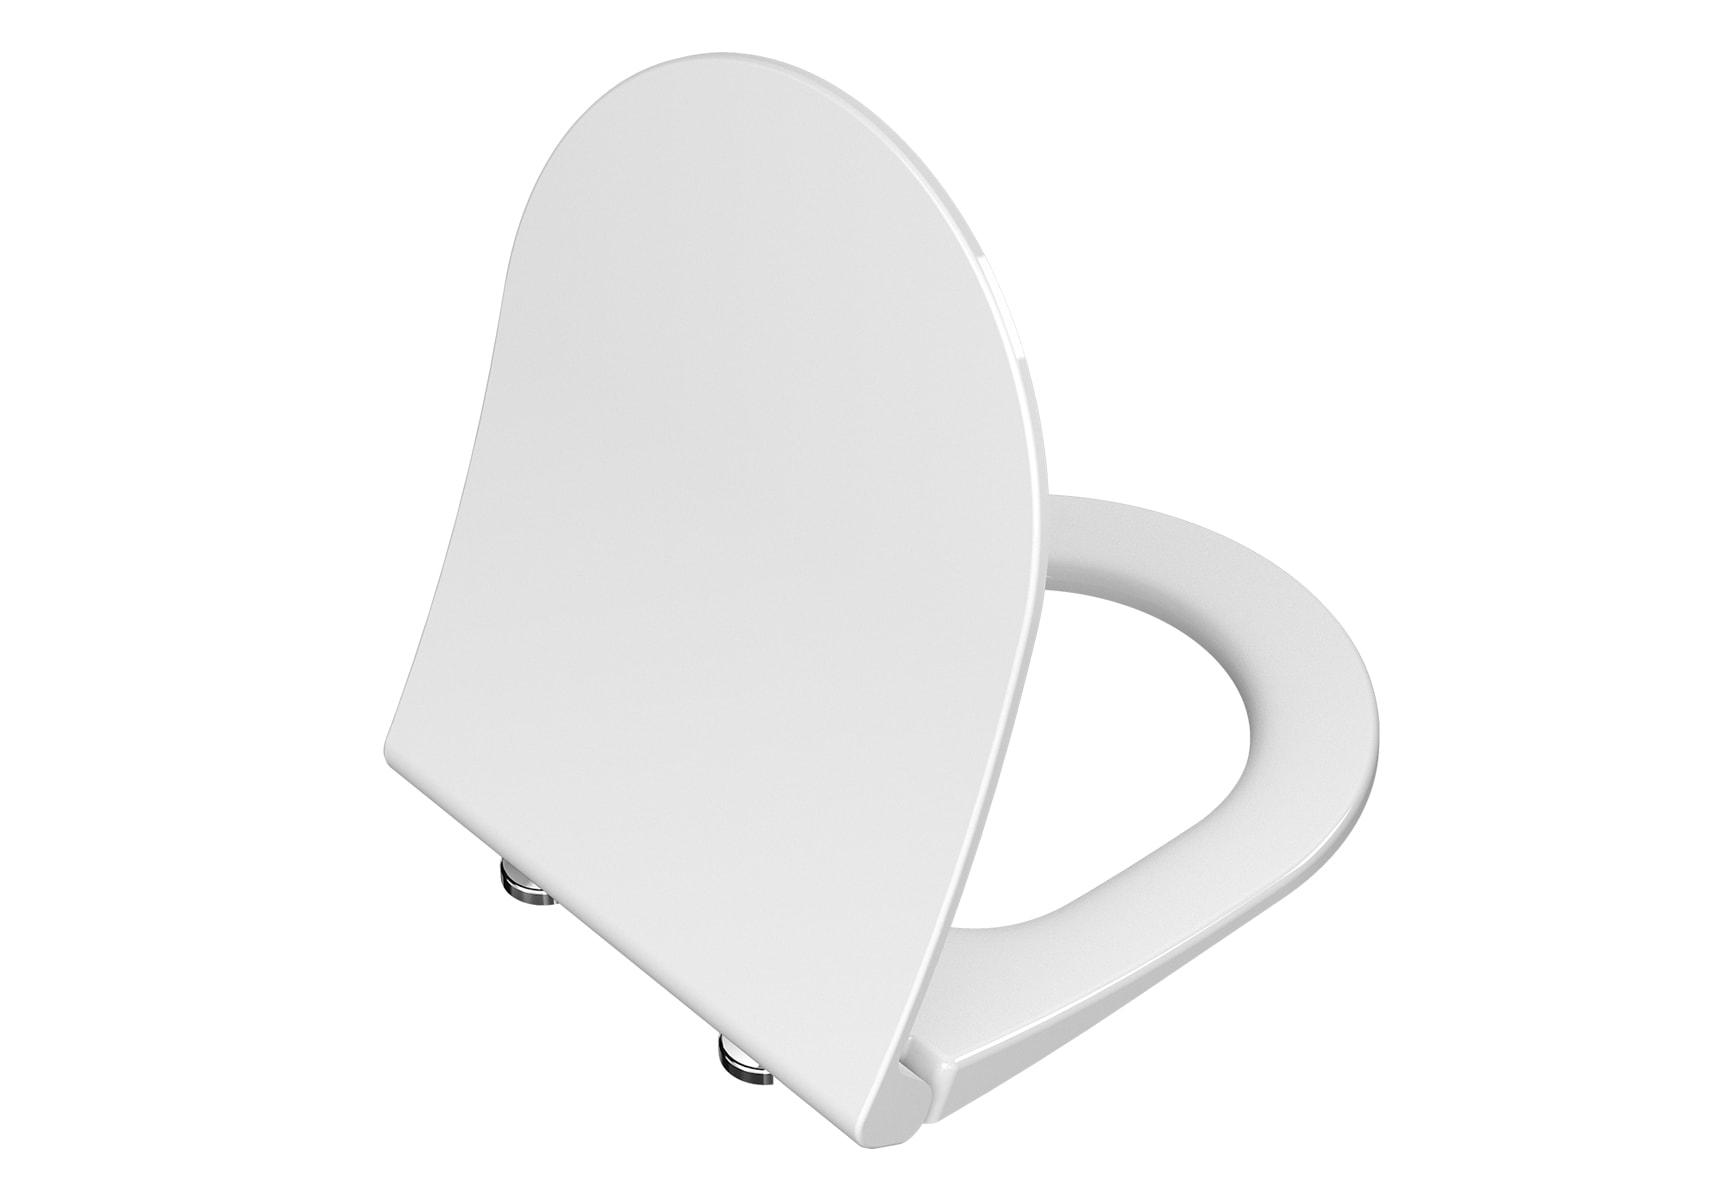 Universal Slim Wc Seat Model 2 – Round Form (Duroplast, Soft-Closing, Detachable Metal Hinge, Top Fixing)